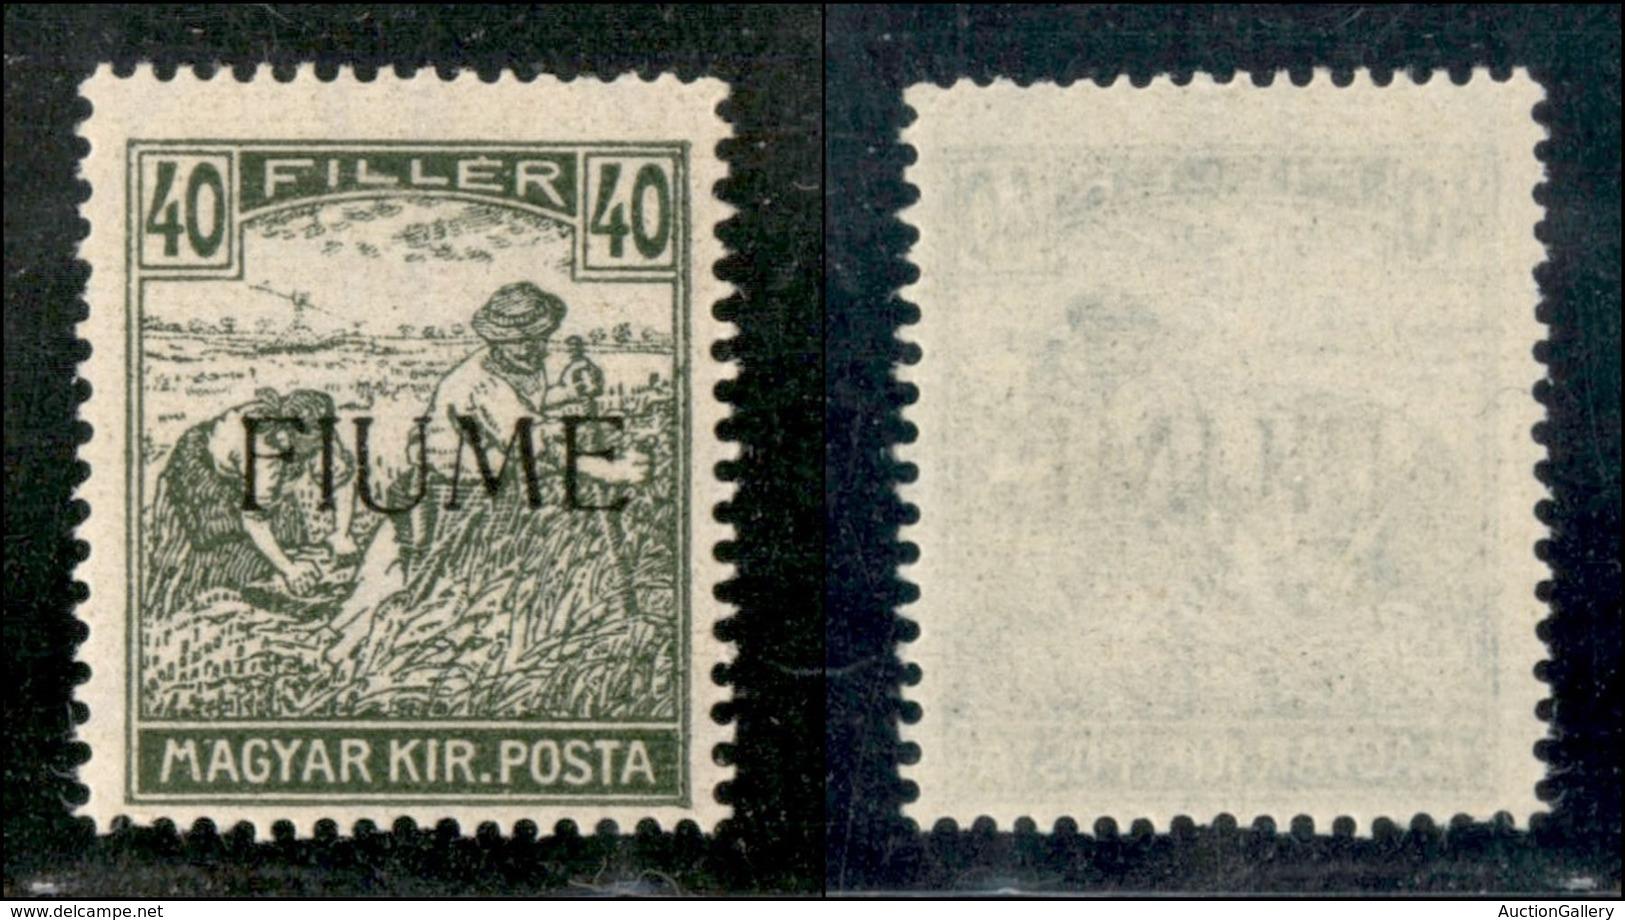 Occupazioni I Guerra Mondiale - Fiume - 1918 - 40 Filler (13) - Gomma Integra (375) - Stamps